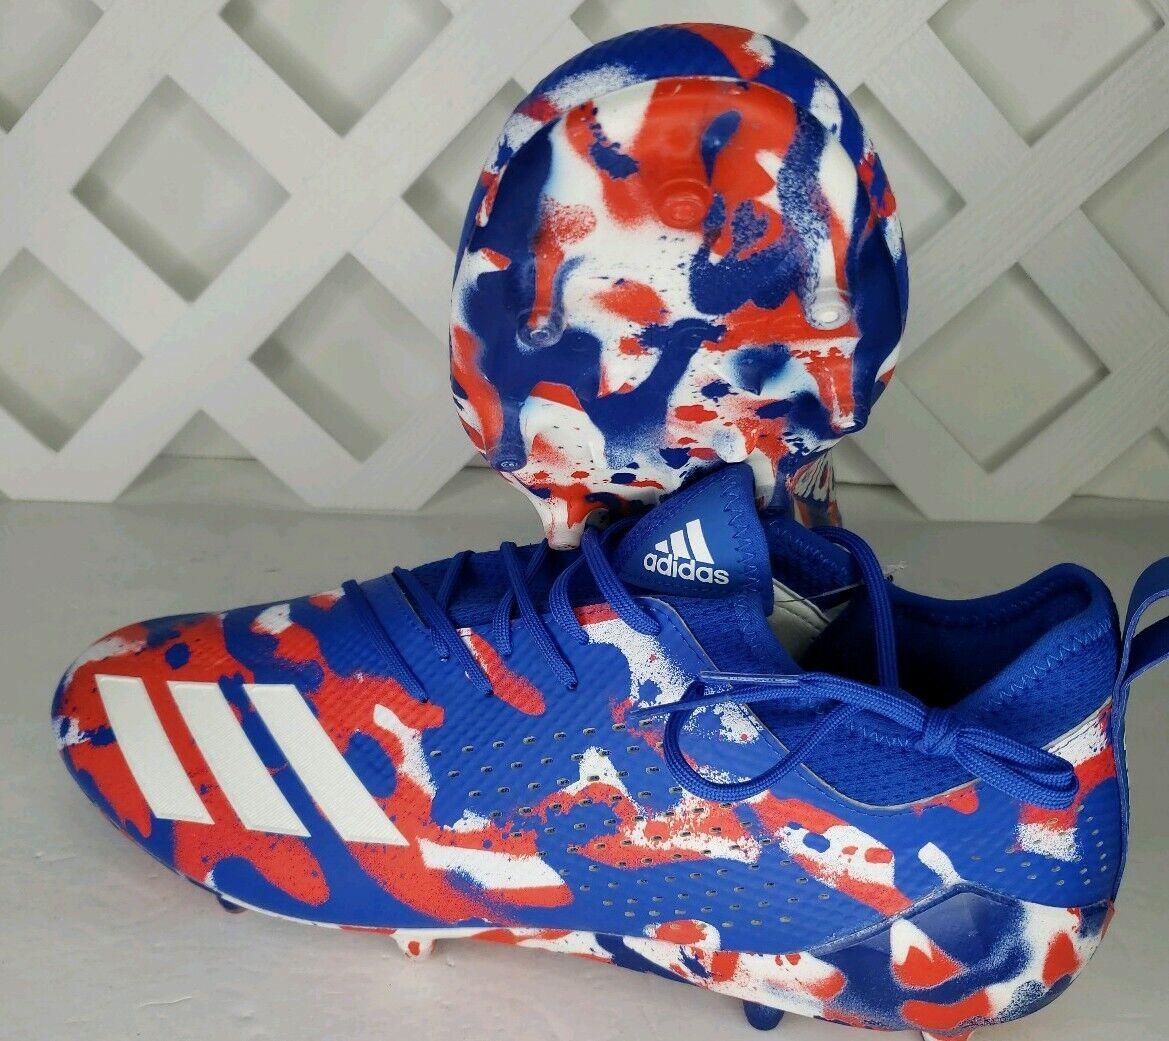 Adidas Adizero 5 Star 7.0 C Red White blueee Football Cleats Size 17 DB0623 New